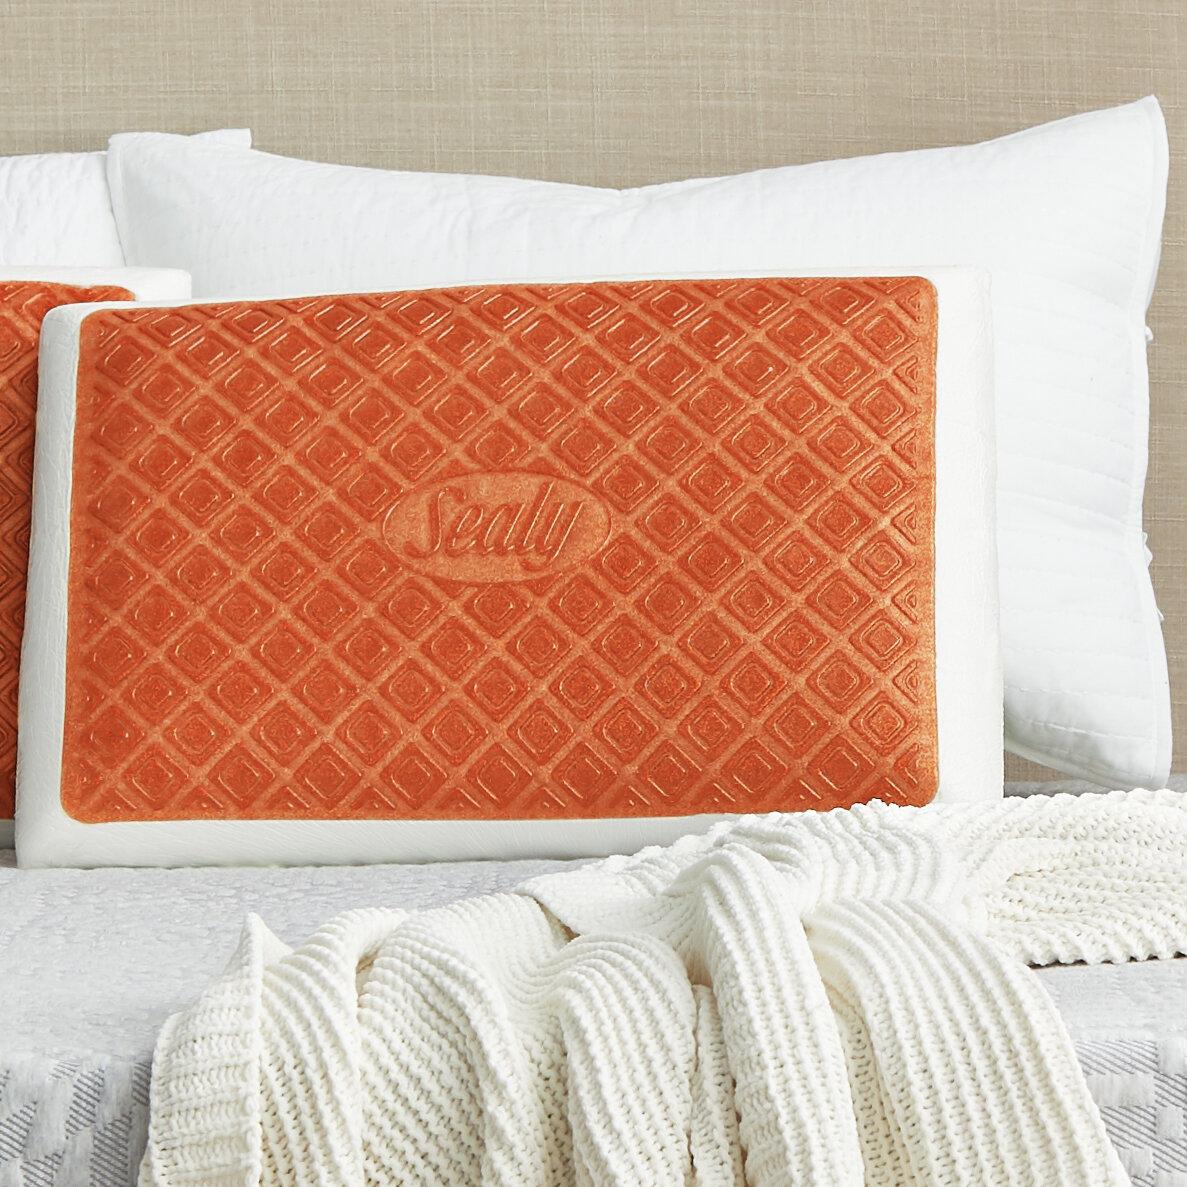 Sealy Infused Gel Memory Foam Medium Support Pillow Reviews Wayfair